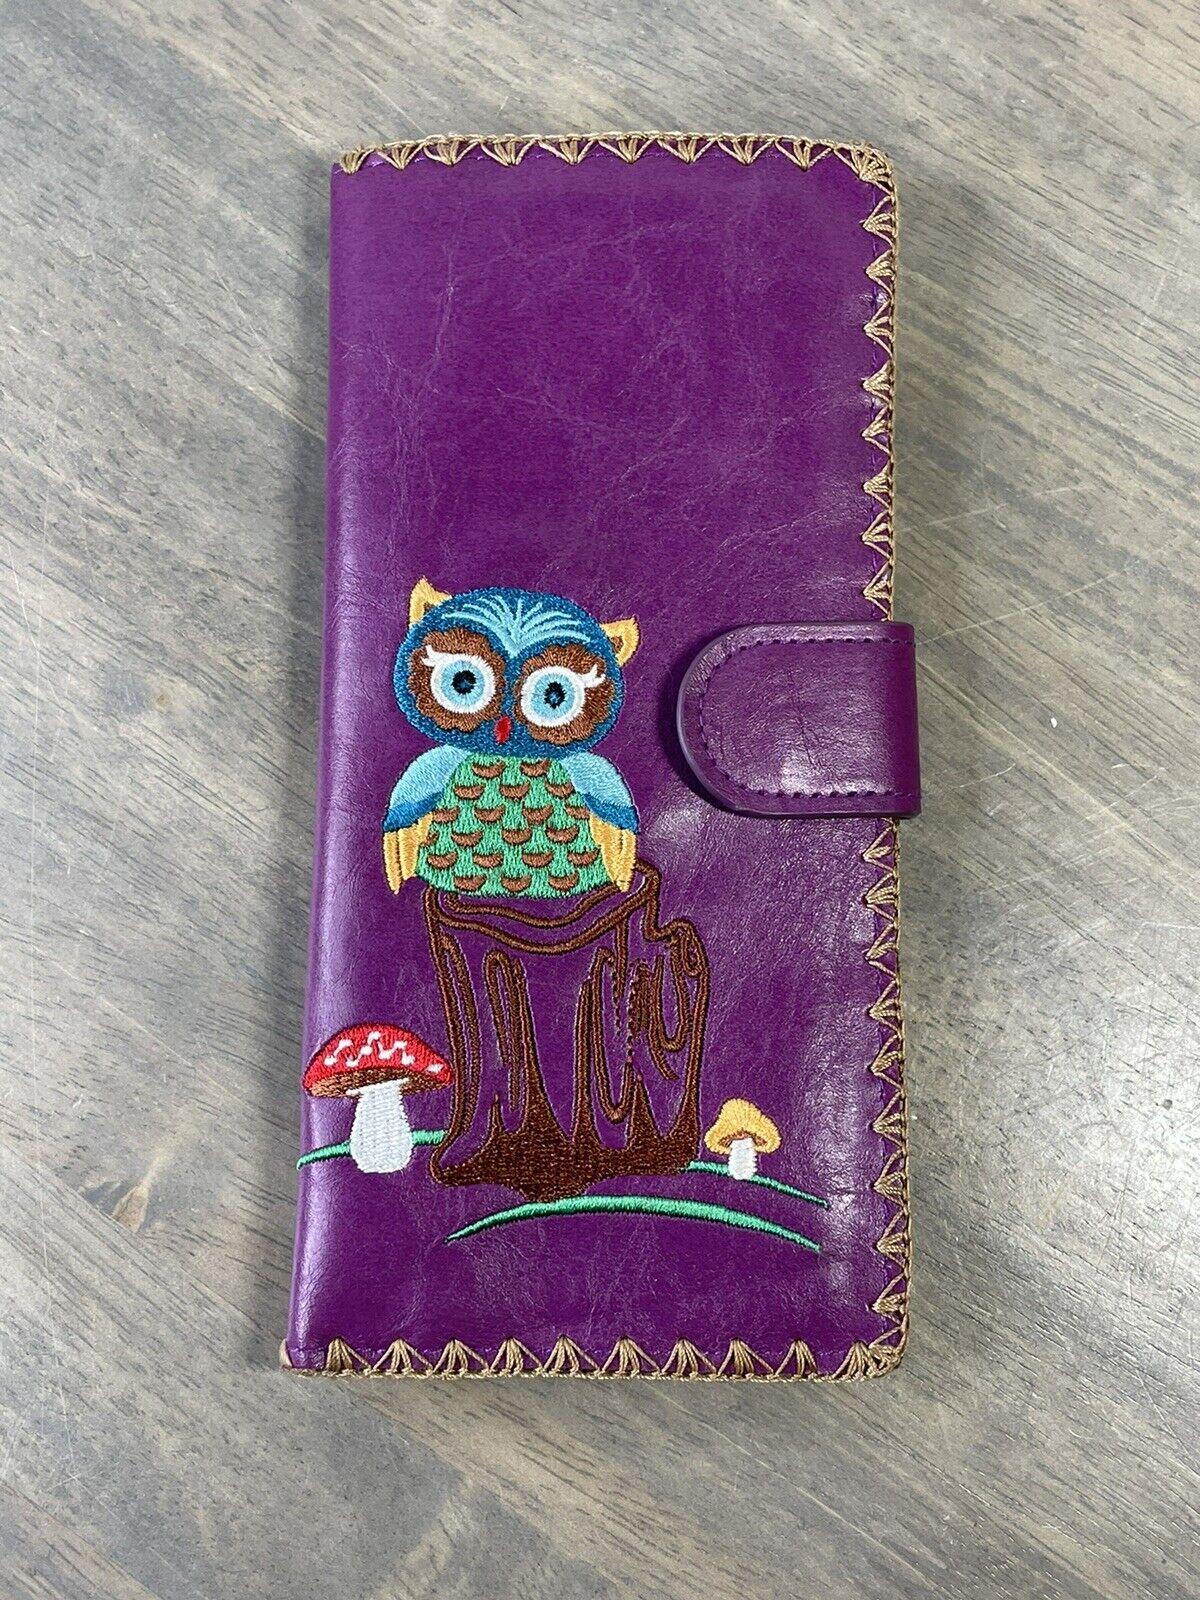 LAVISHY Owl and Mushrooms EMBROIDERED LARGE WALLET VEGAN FAUX LEATHER Purple